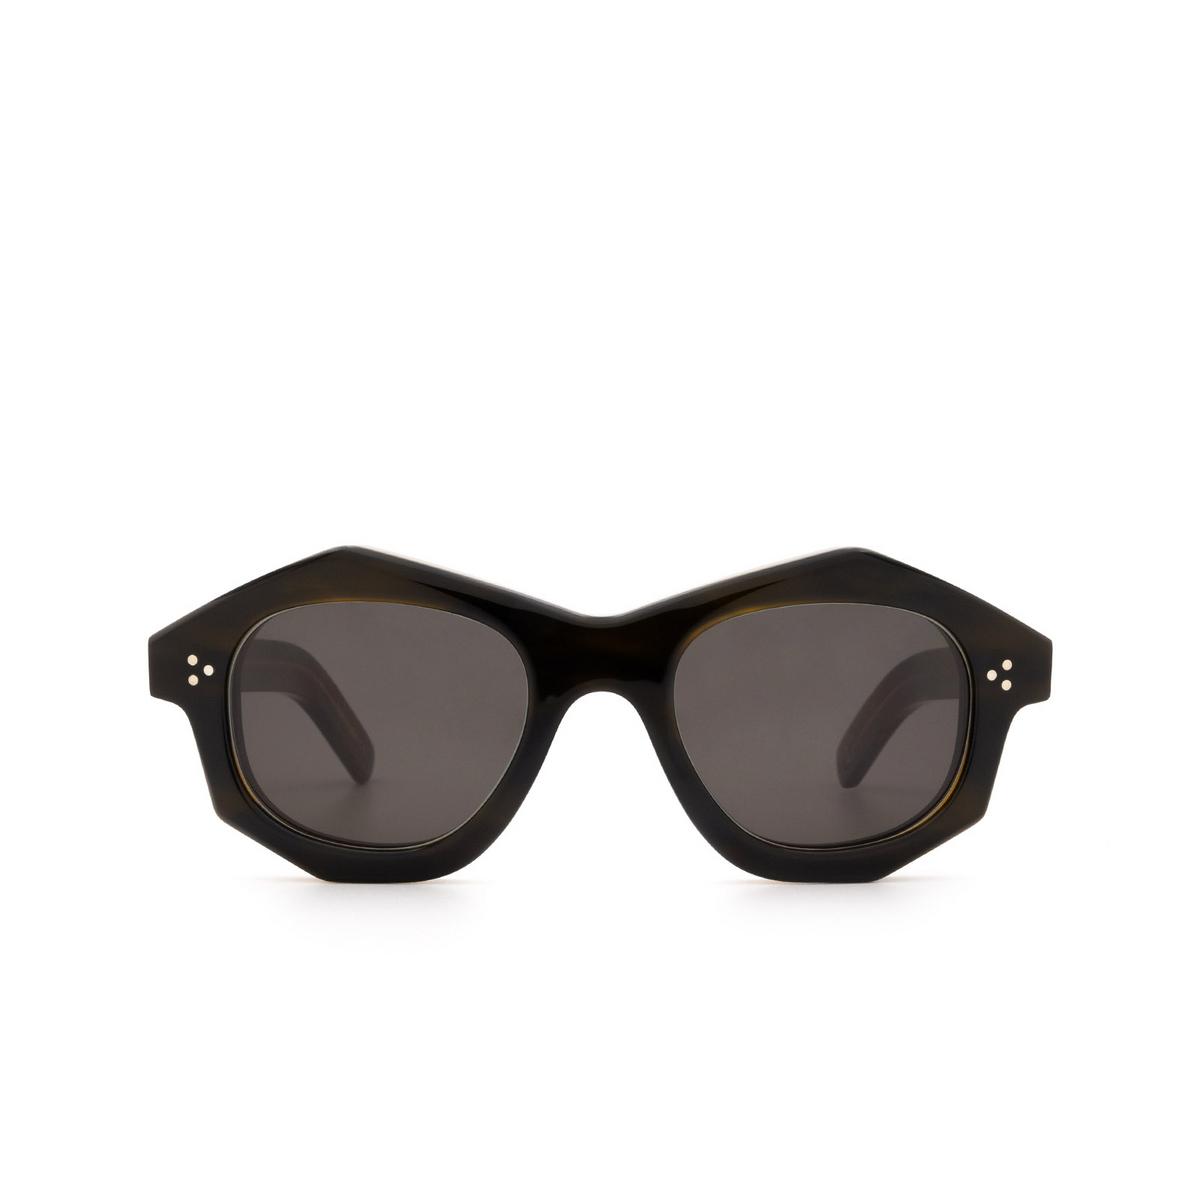 Lesca® Irregular Sunglasses: Dada Sun color Kaki - front view.